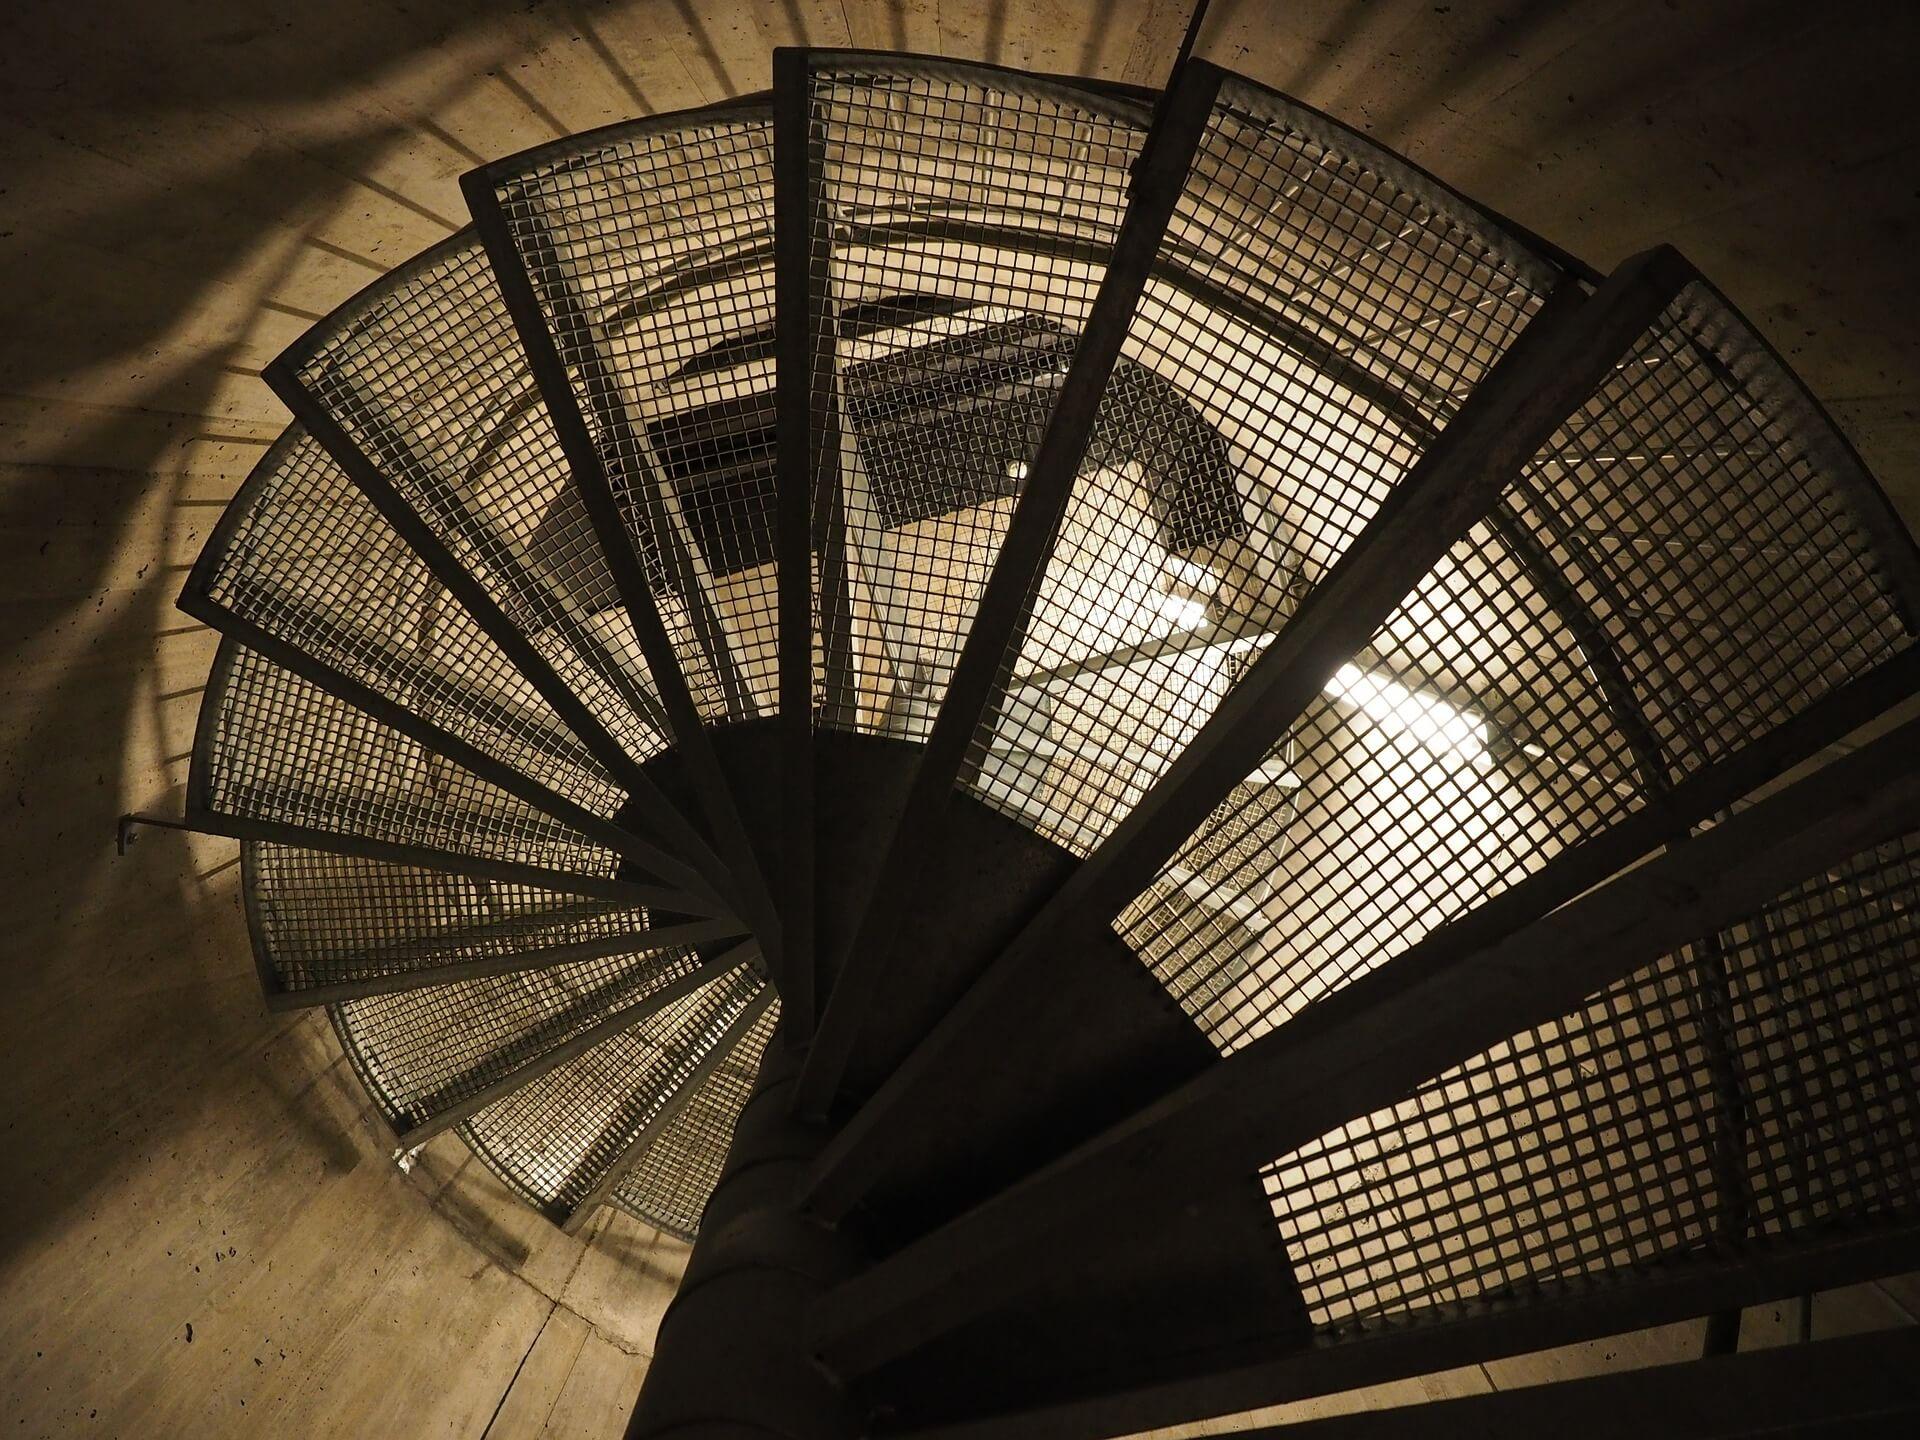 spiral-staircase-505975_1920